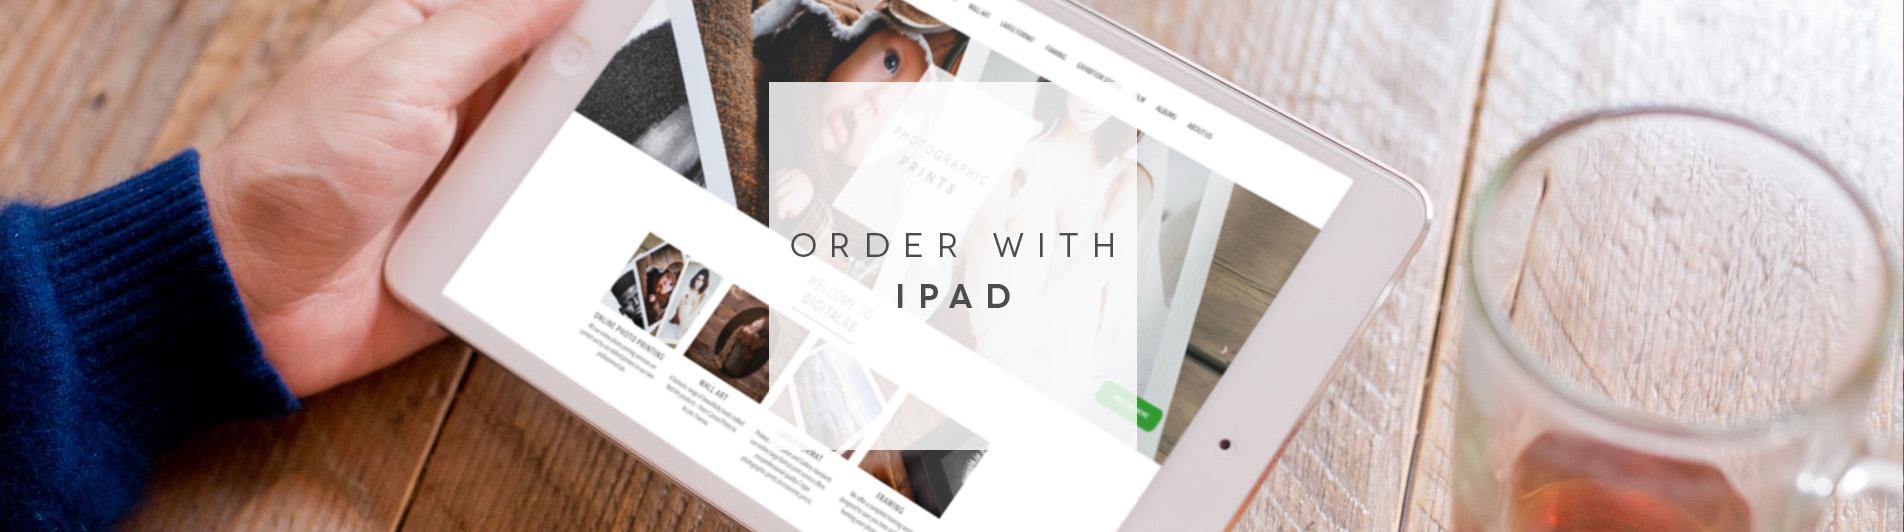 Order with IPad